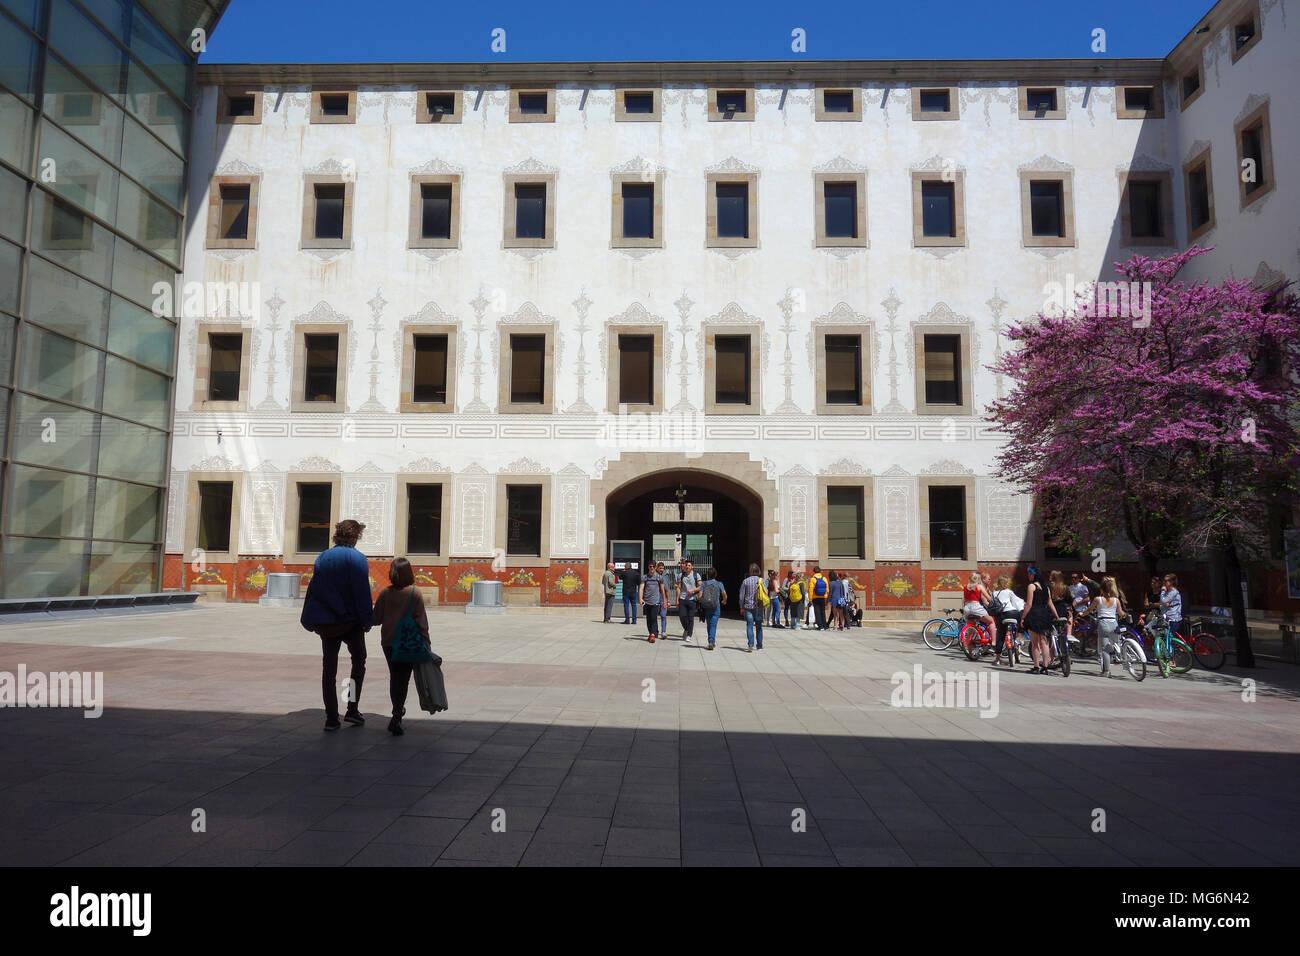 Centre de Cultura Contemporània, Barcelona, Catalonia, Spain - Stock Image